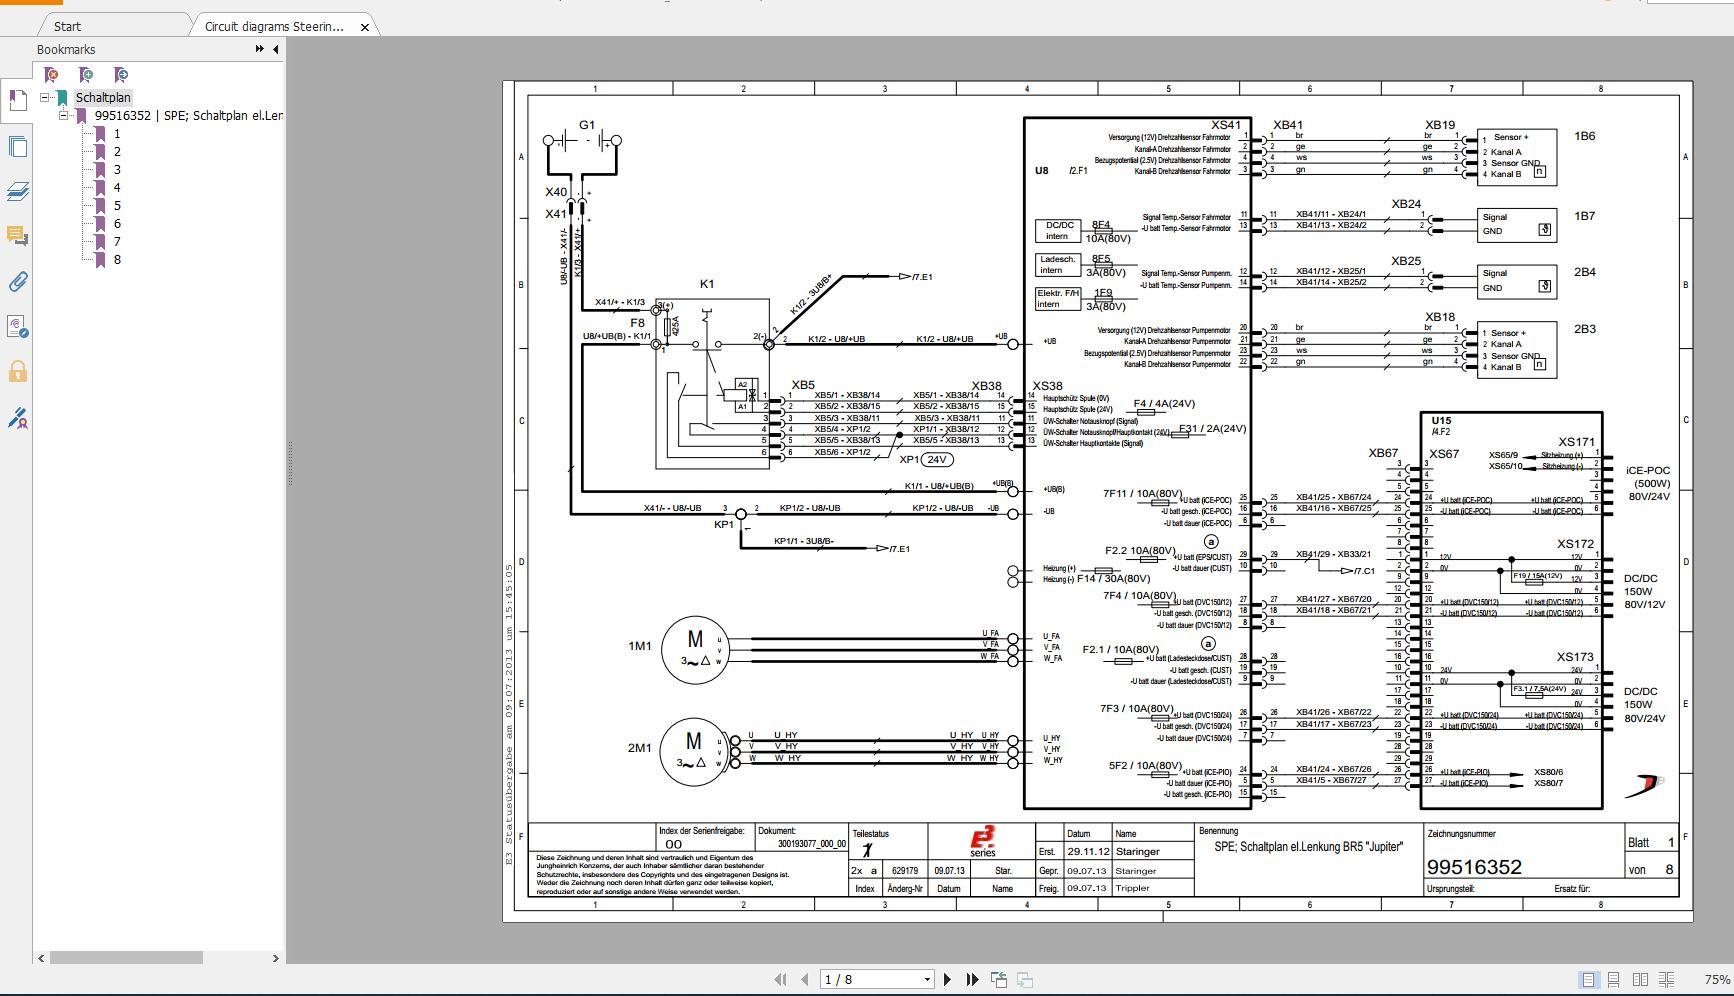 mitsubishi forklift wiring diagrams - wiring diagram mug-limit -  mug-limit.cfcarsnoleggio.it  cfcarsnoleggio.it